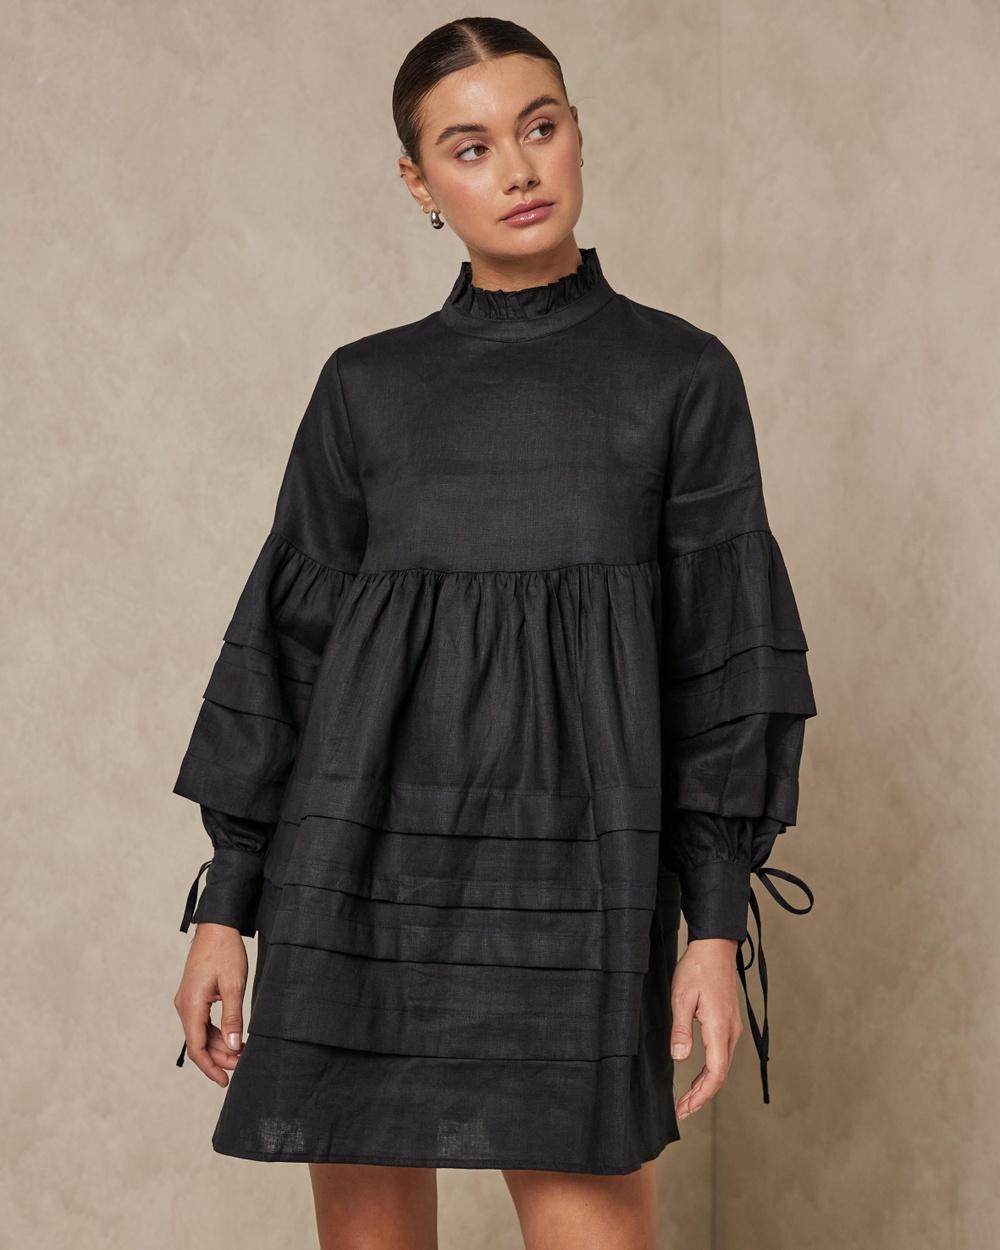 AERE Pleat Detail Linen Smock Dress Dresses Black Australia